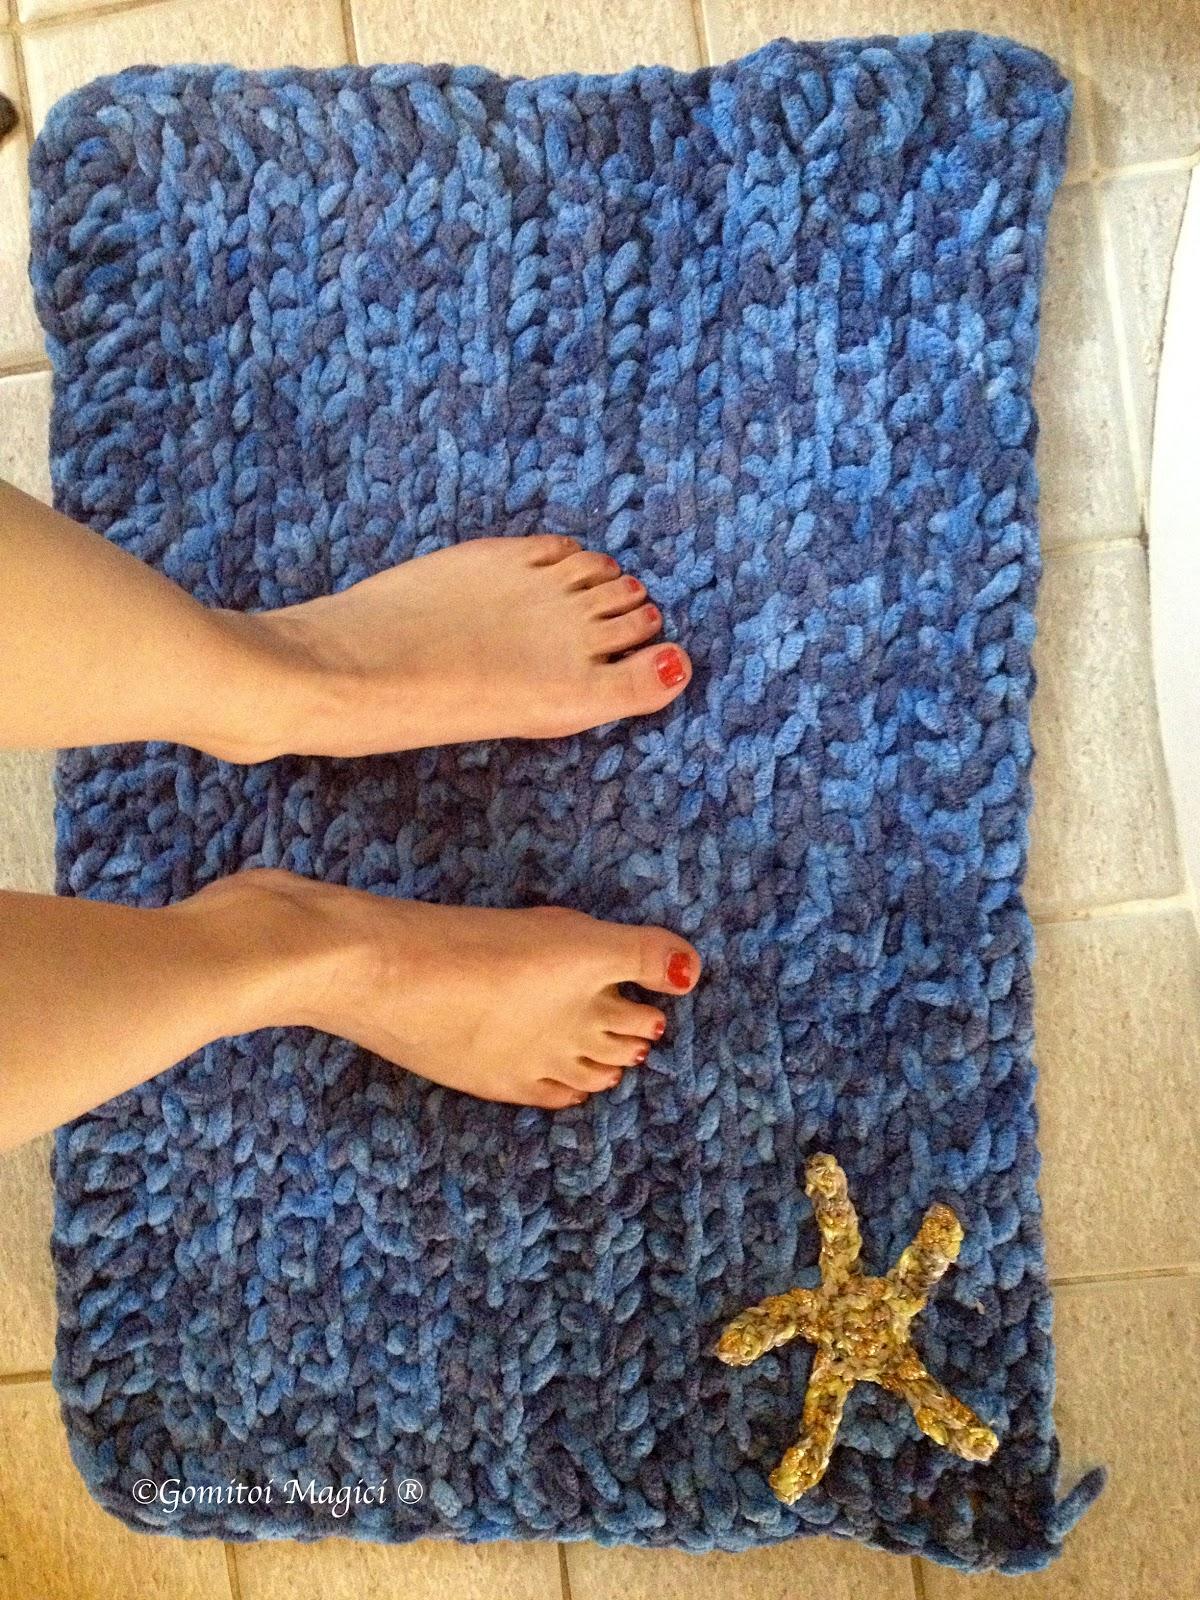 Tappeti Bagno Uncinetto : Tappeti bagno uncinetto